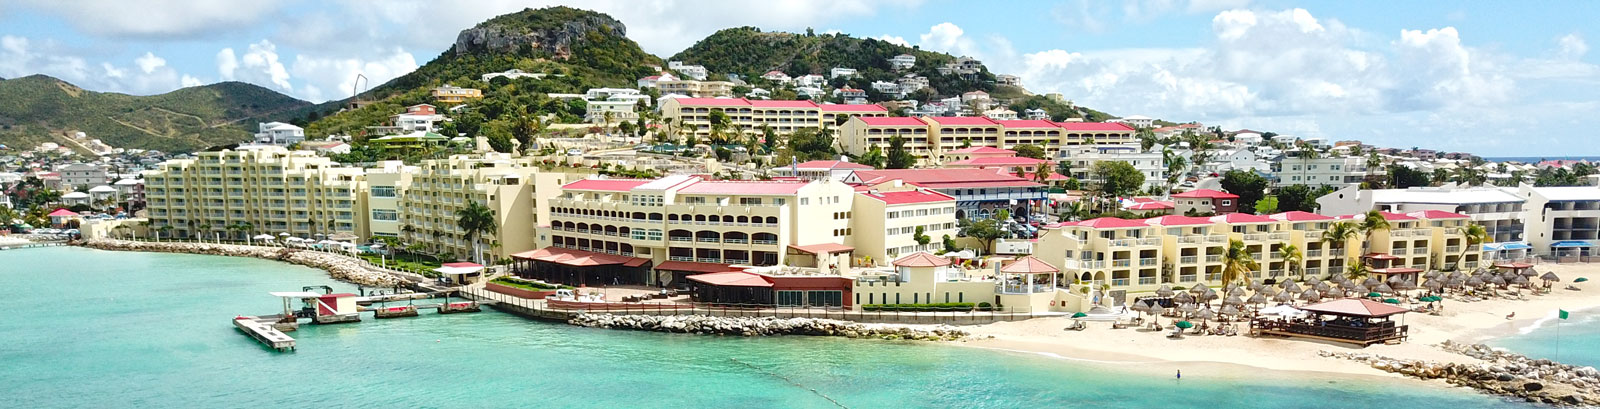 Plan du site, Simpson Bay Resort & Marina